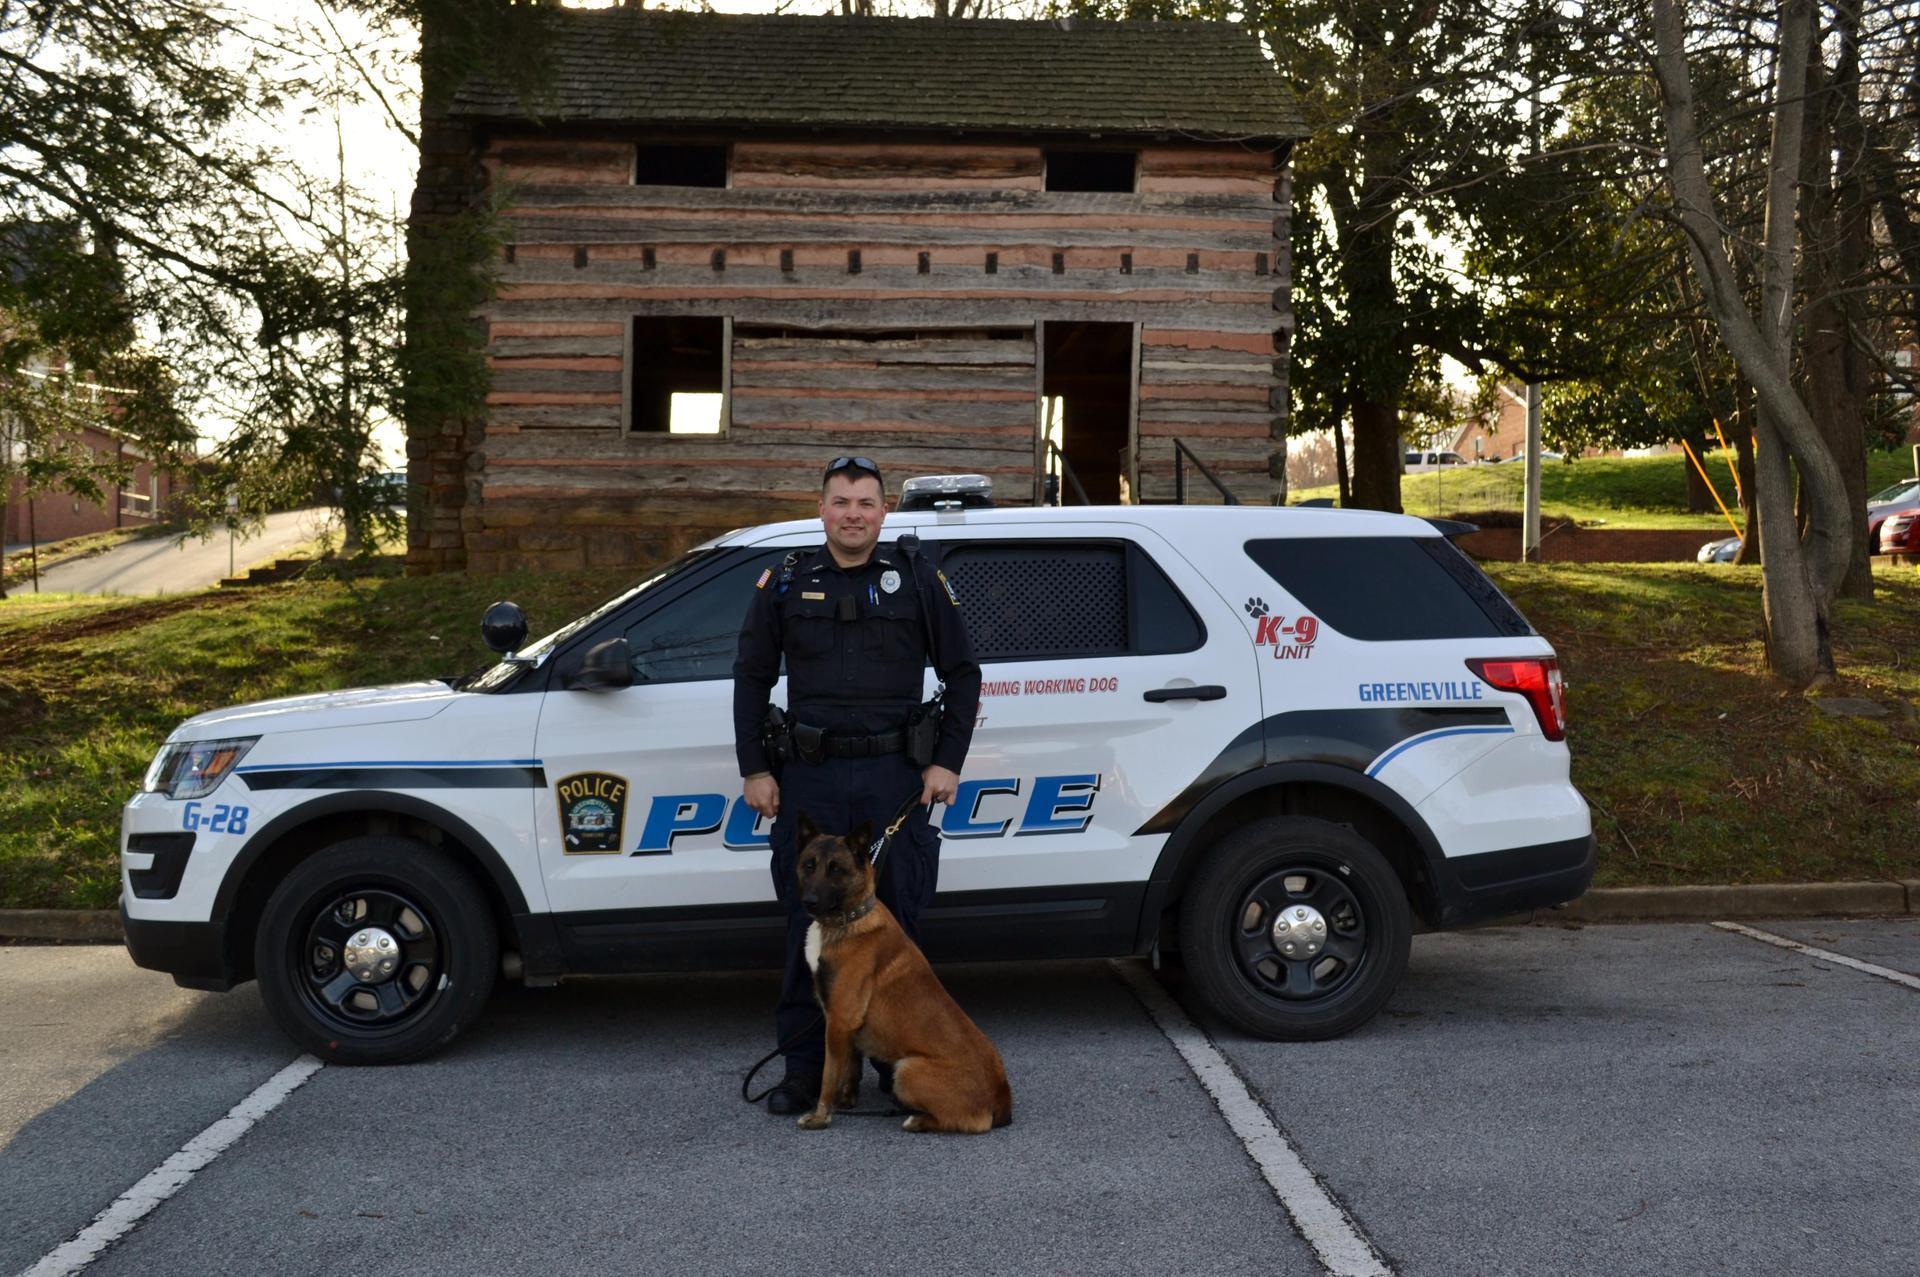 Officer E Davis and Kidd